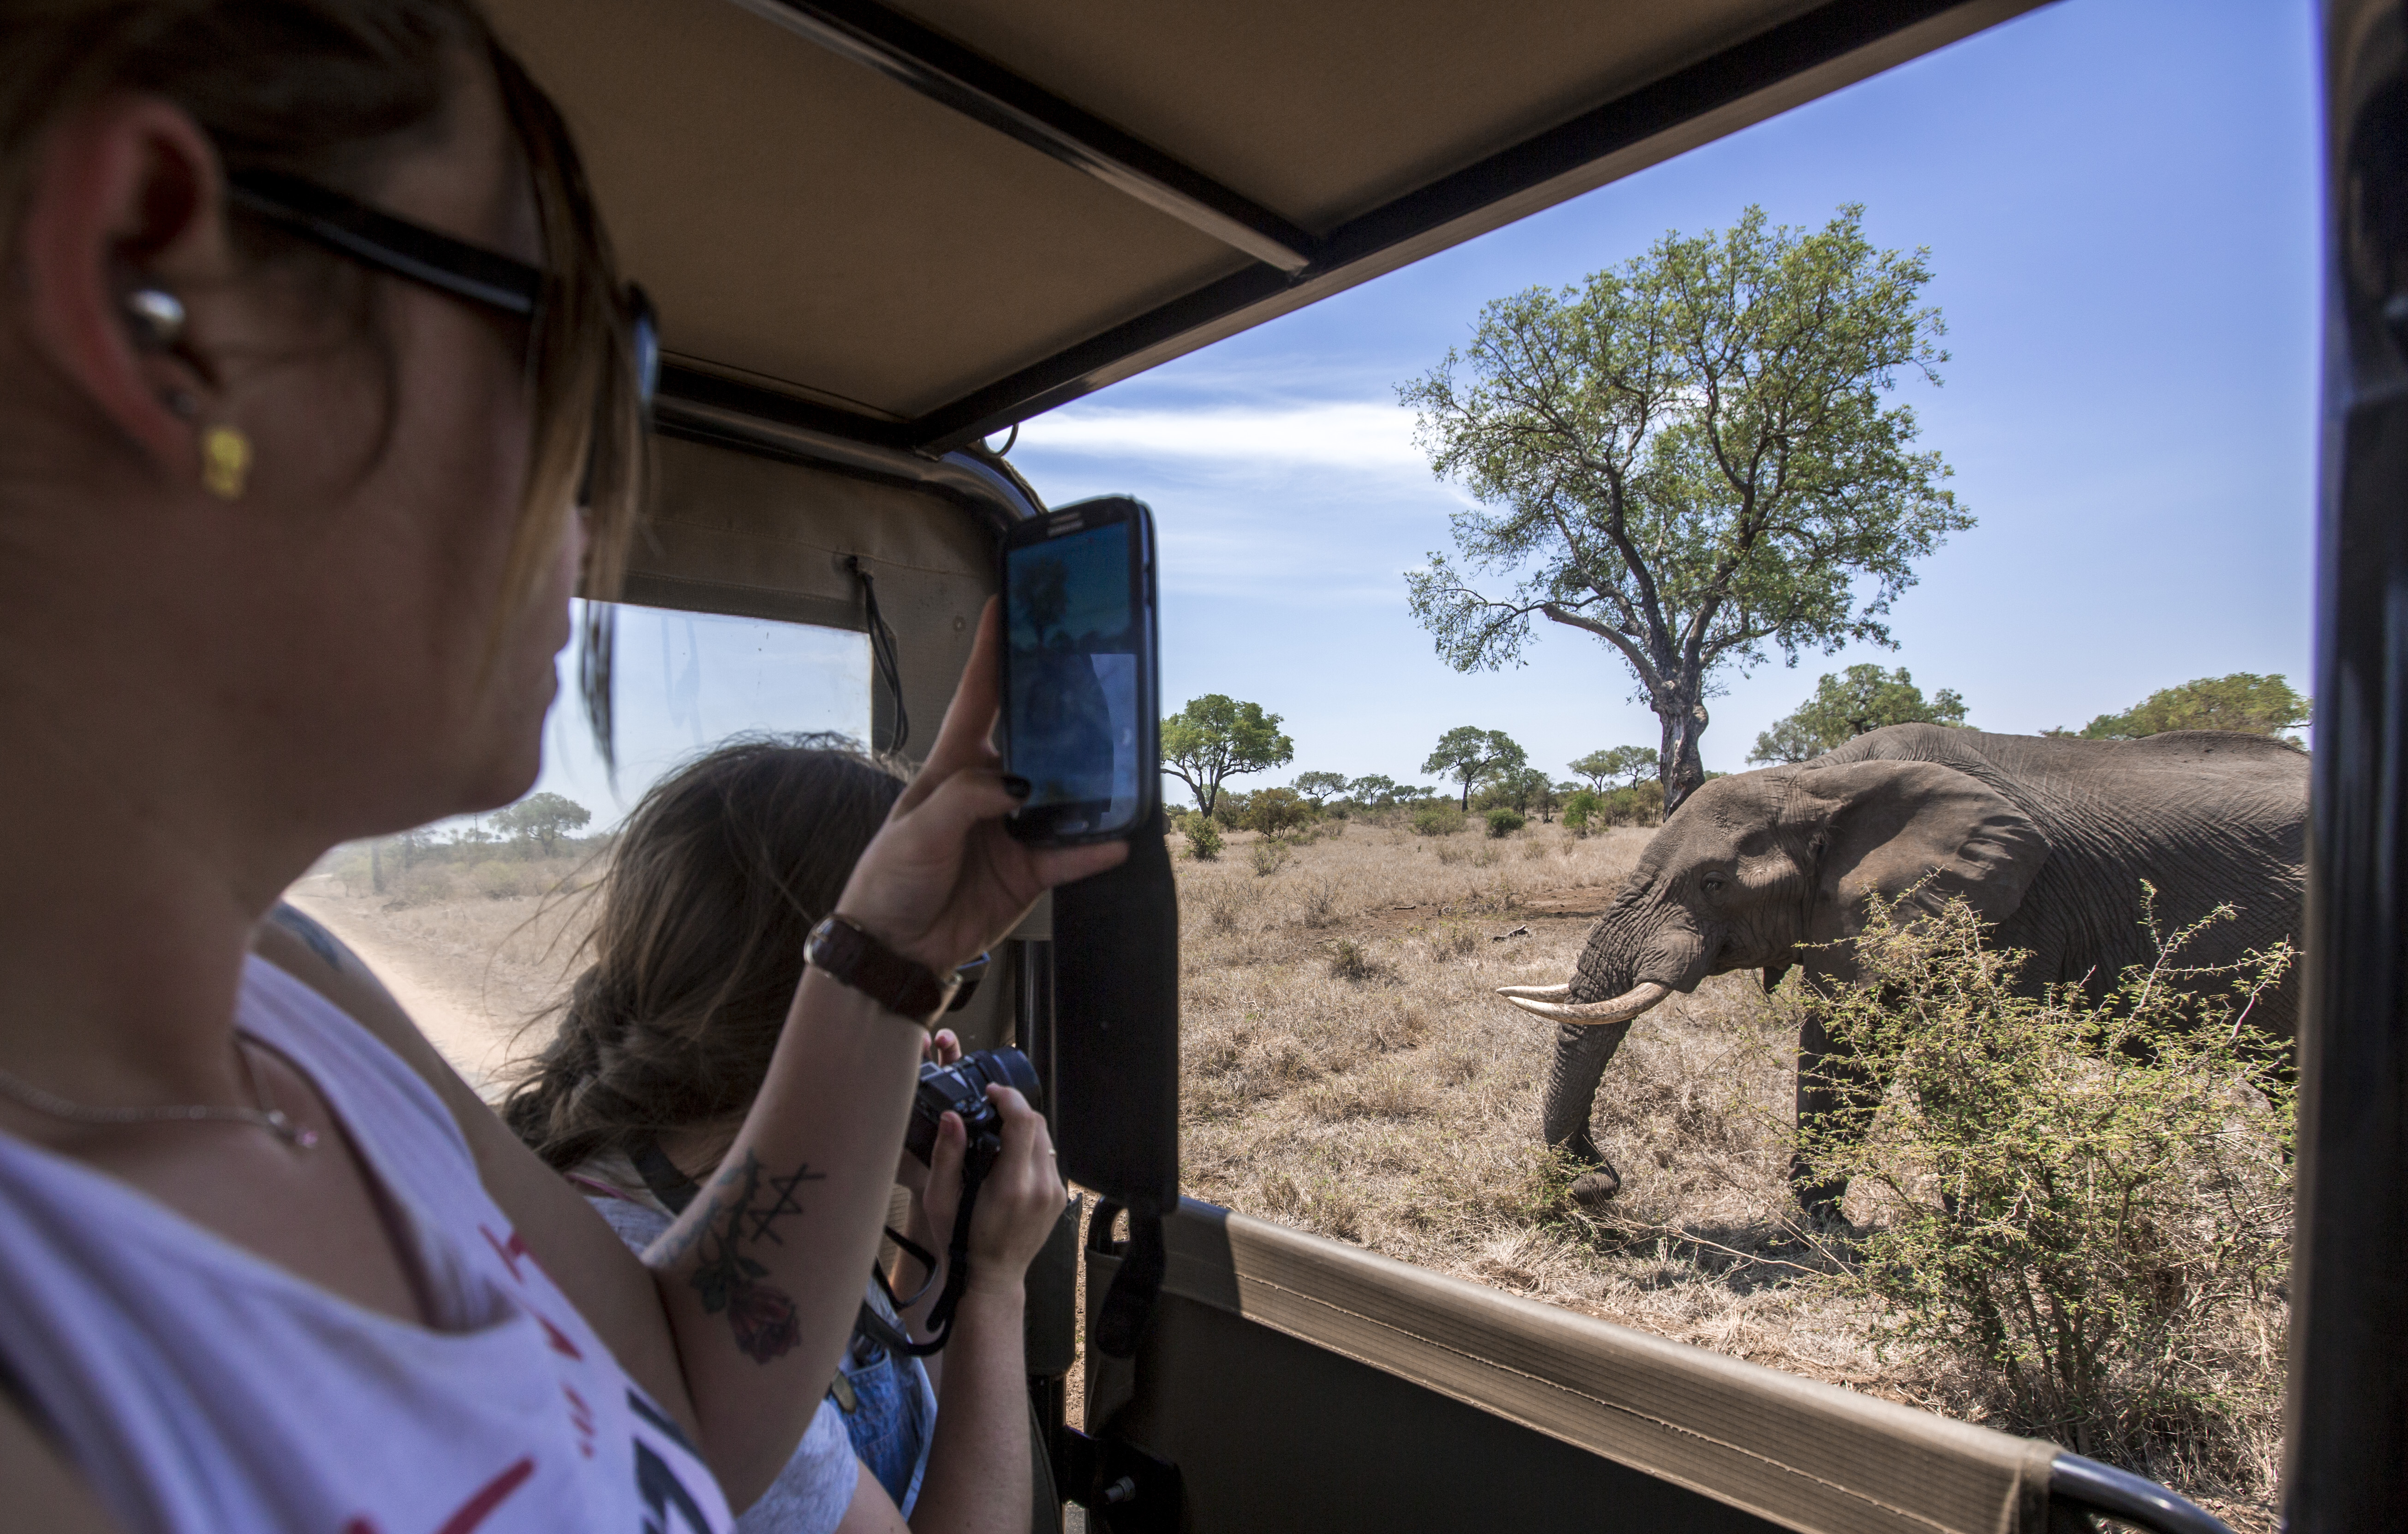 Der Süden Afrikas nach Maß – Kapstadt, Krüger & Simbabwe